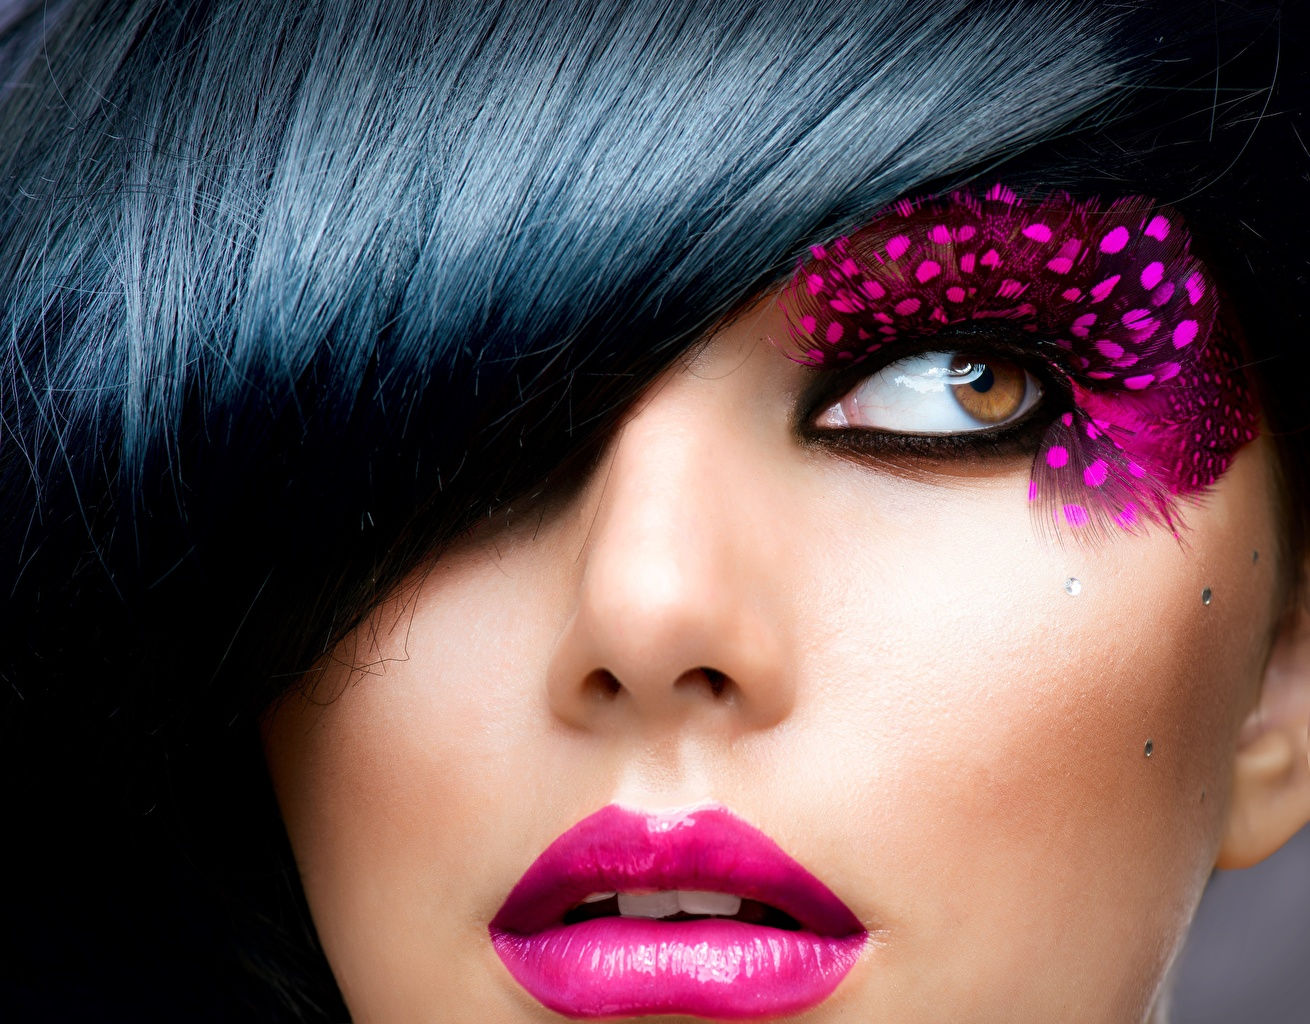 Desktop Wallpapers Eyes Brunette girl Makeup Face Girls Glance Closeup female young woman Staring